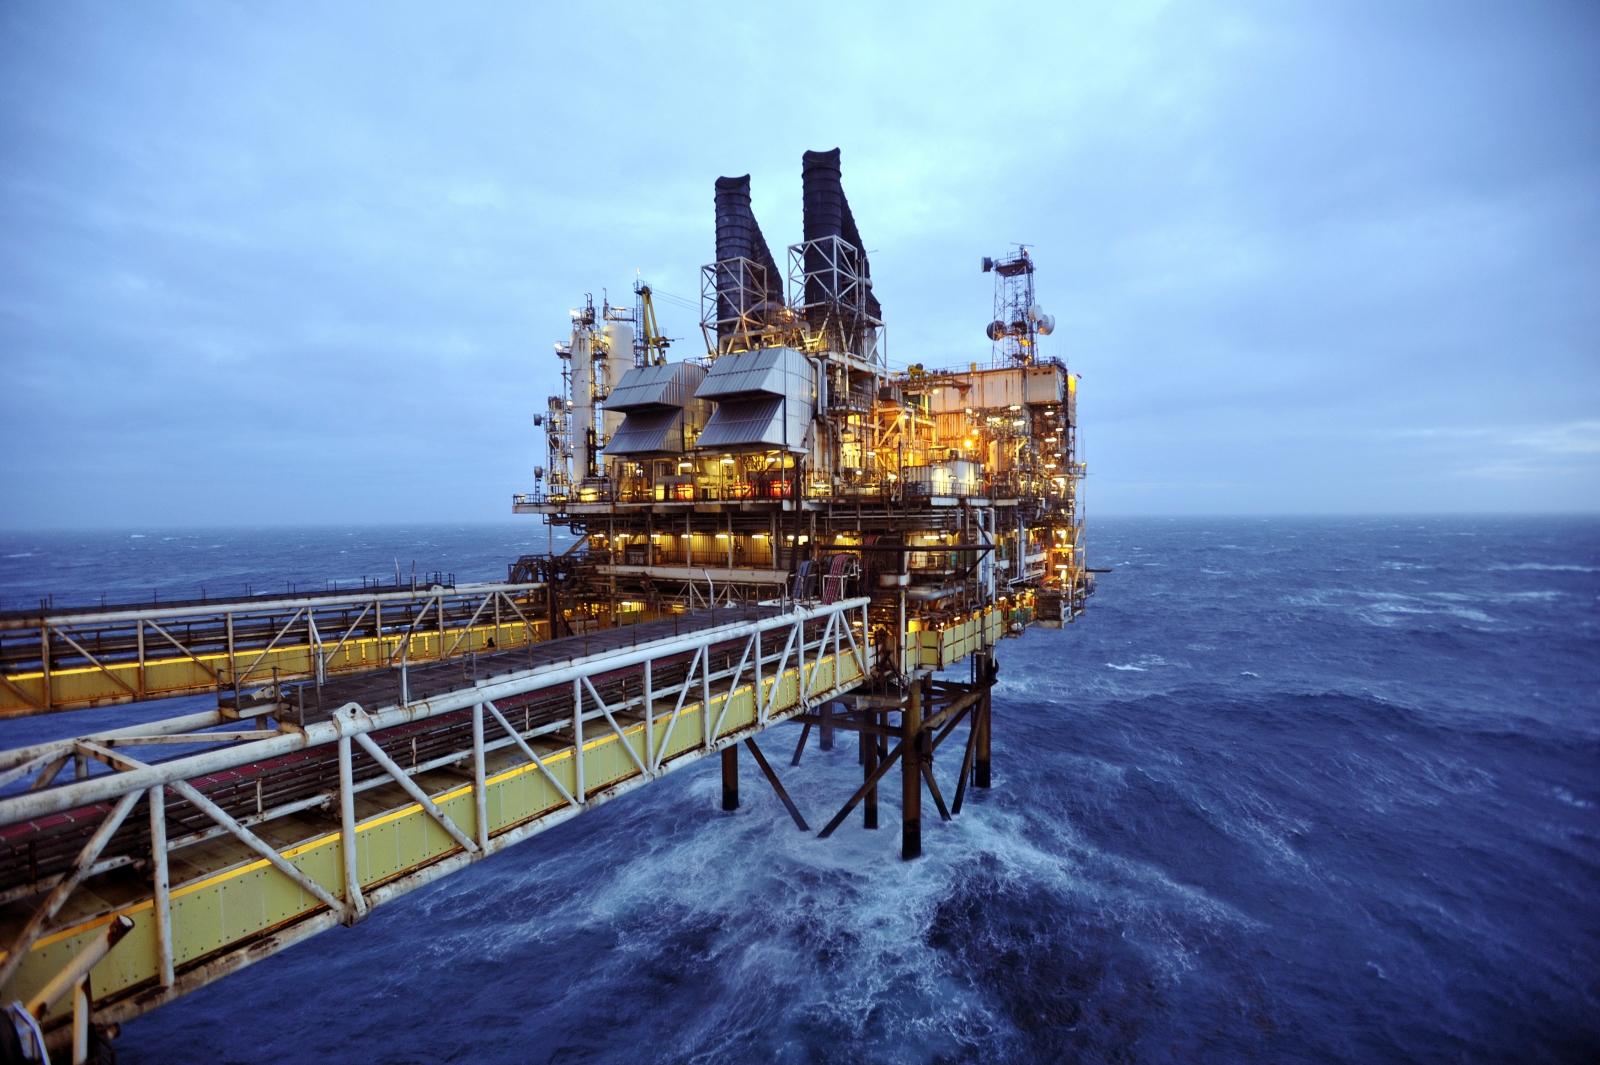 BP oil platform, North Sea